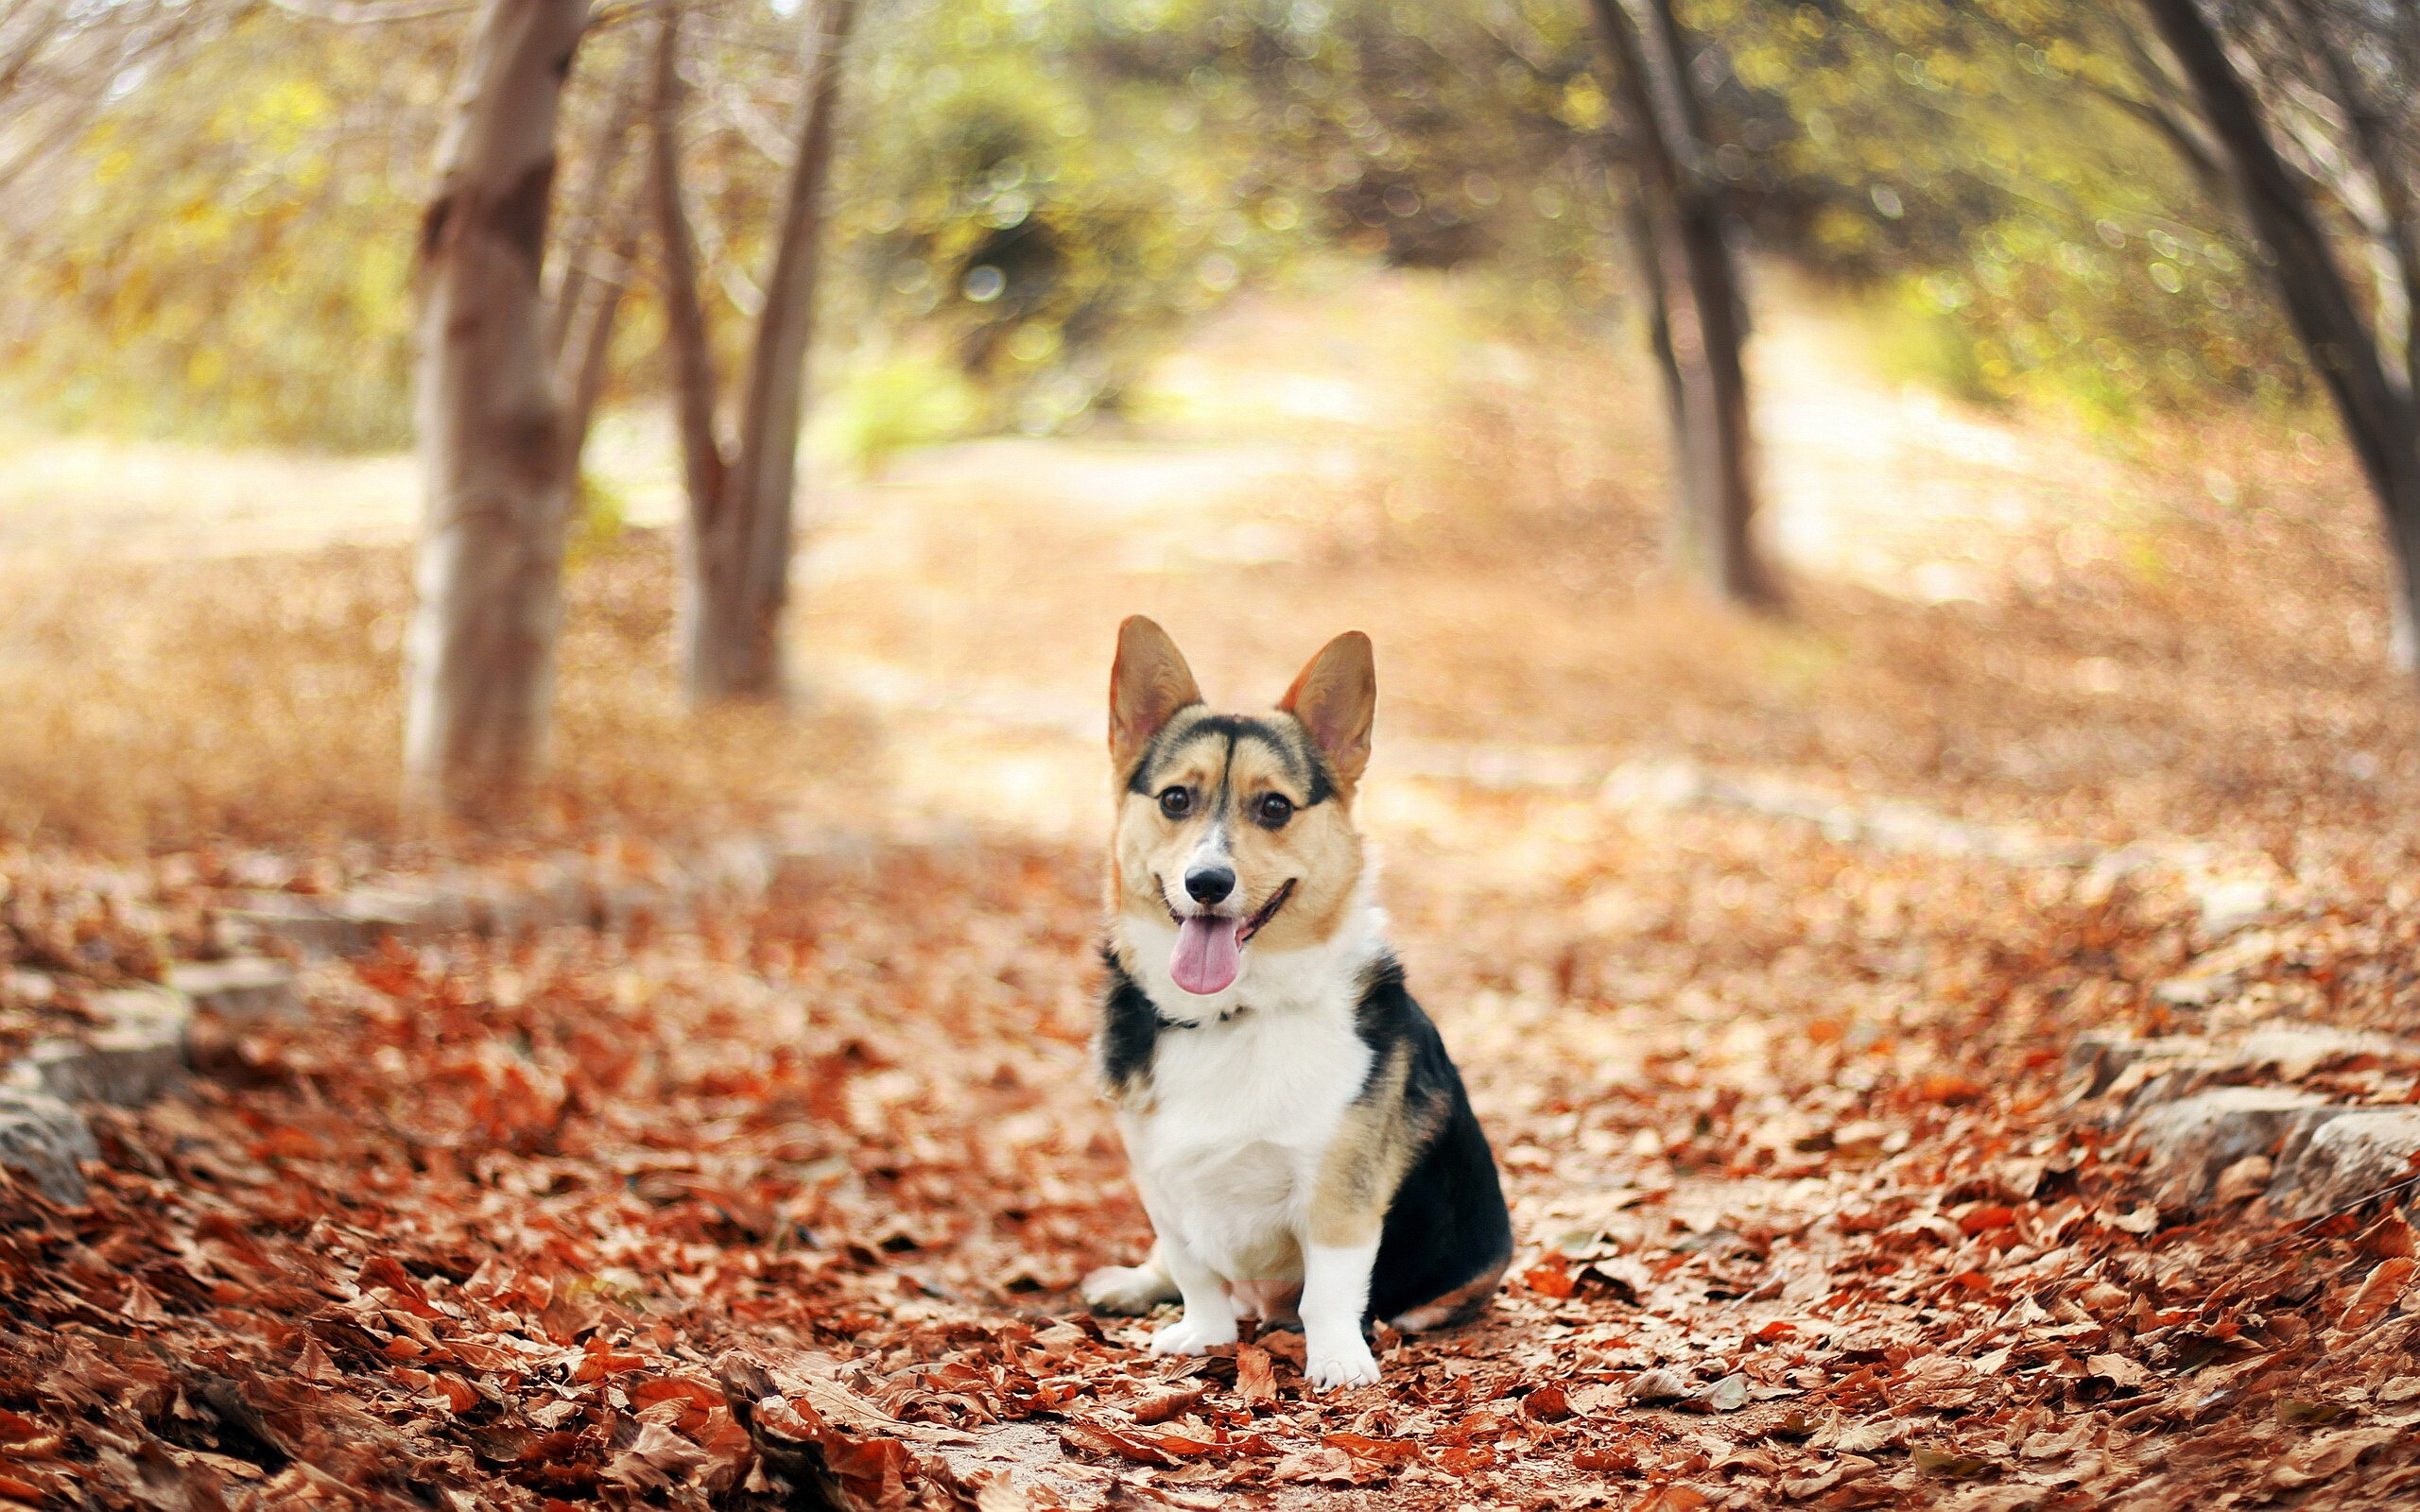 Cute Dog Animal In Garden Hd Wallpapers Hd Wallpapers